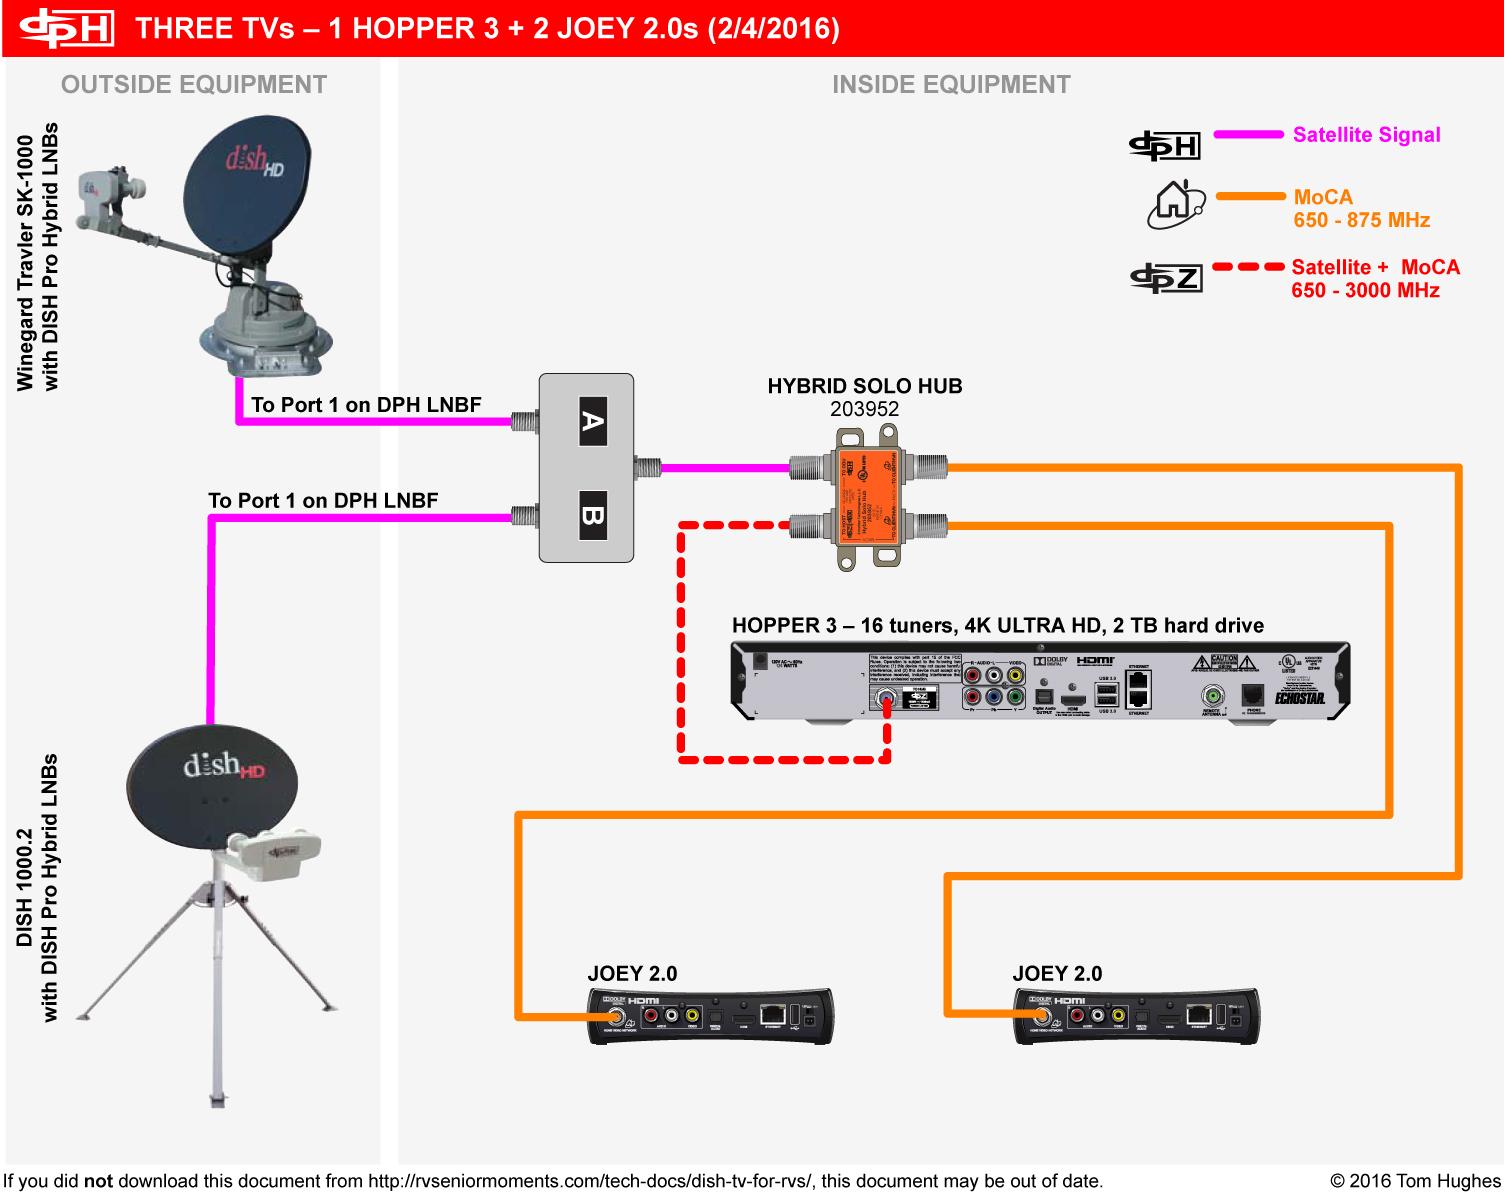 Jd 2240 Wiring Diagram Schematics John Deere 4230 Free Picture Download U2022 Playapk Co 301